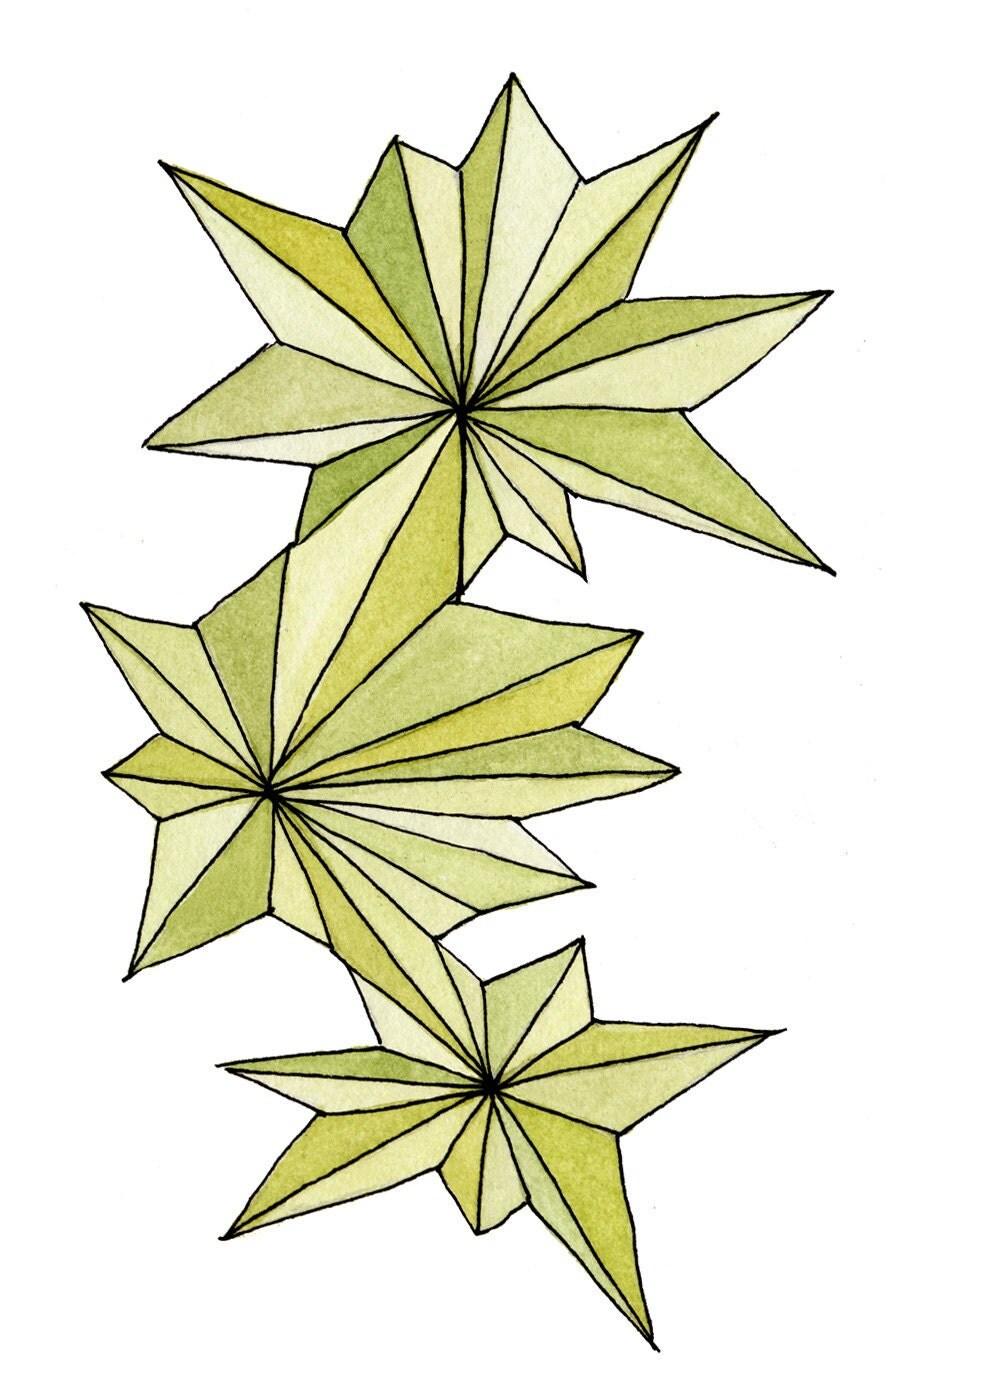 Green Burst - 5x7 Print